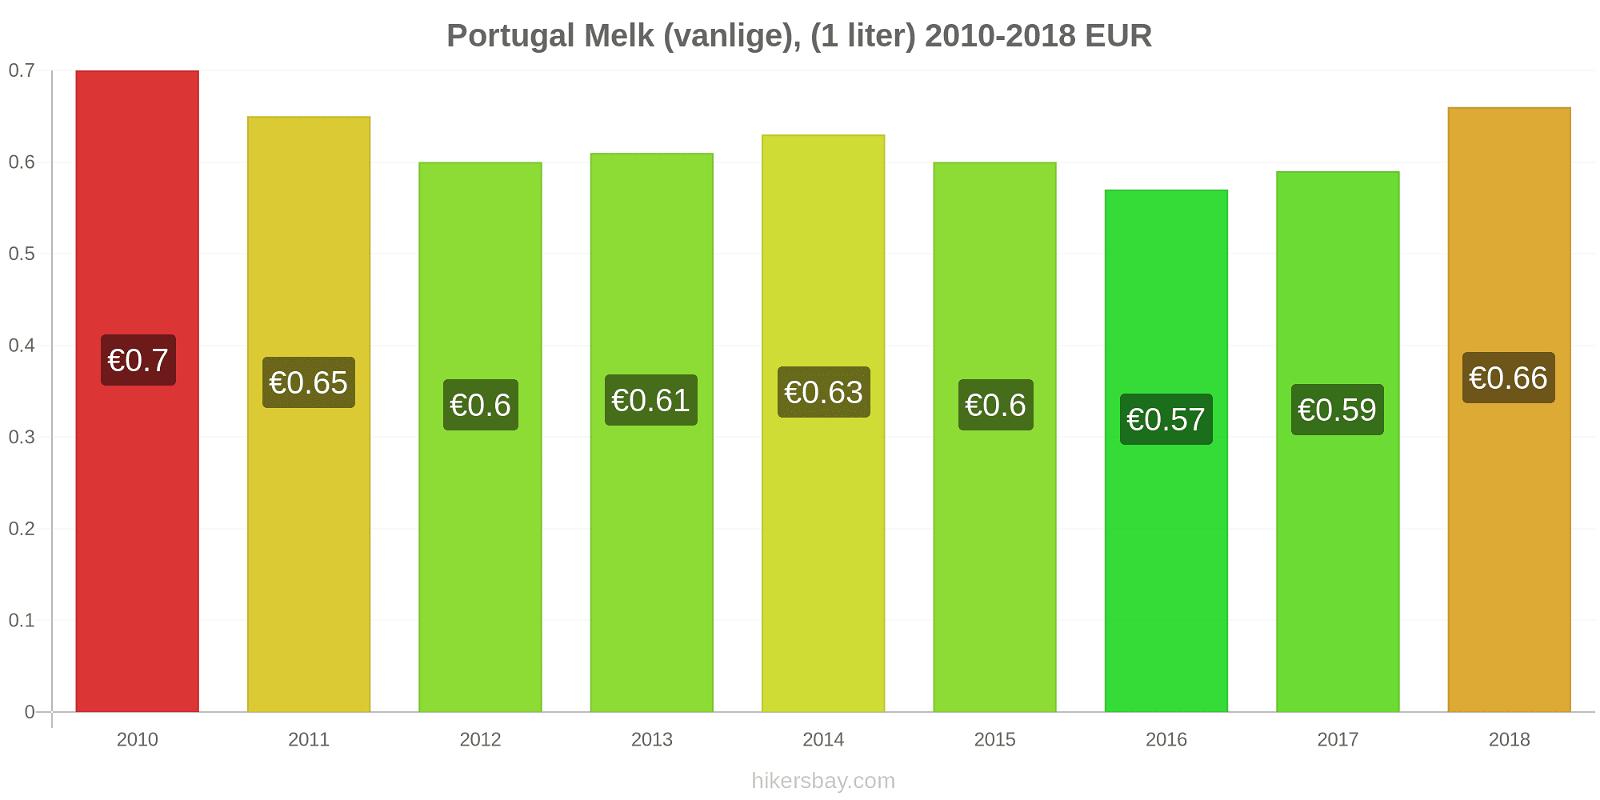 Portugal prisendringer Melk (vanlige), (1 liter) hikersbay.com